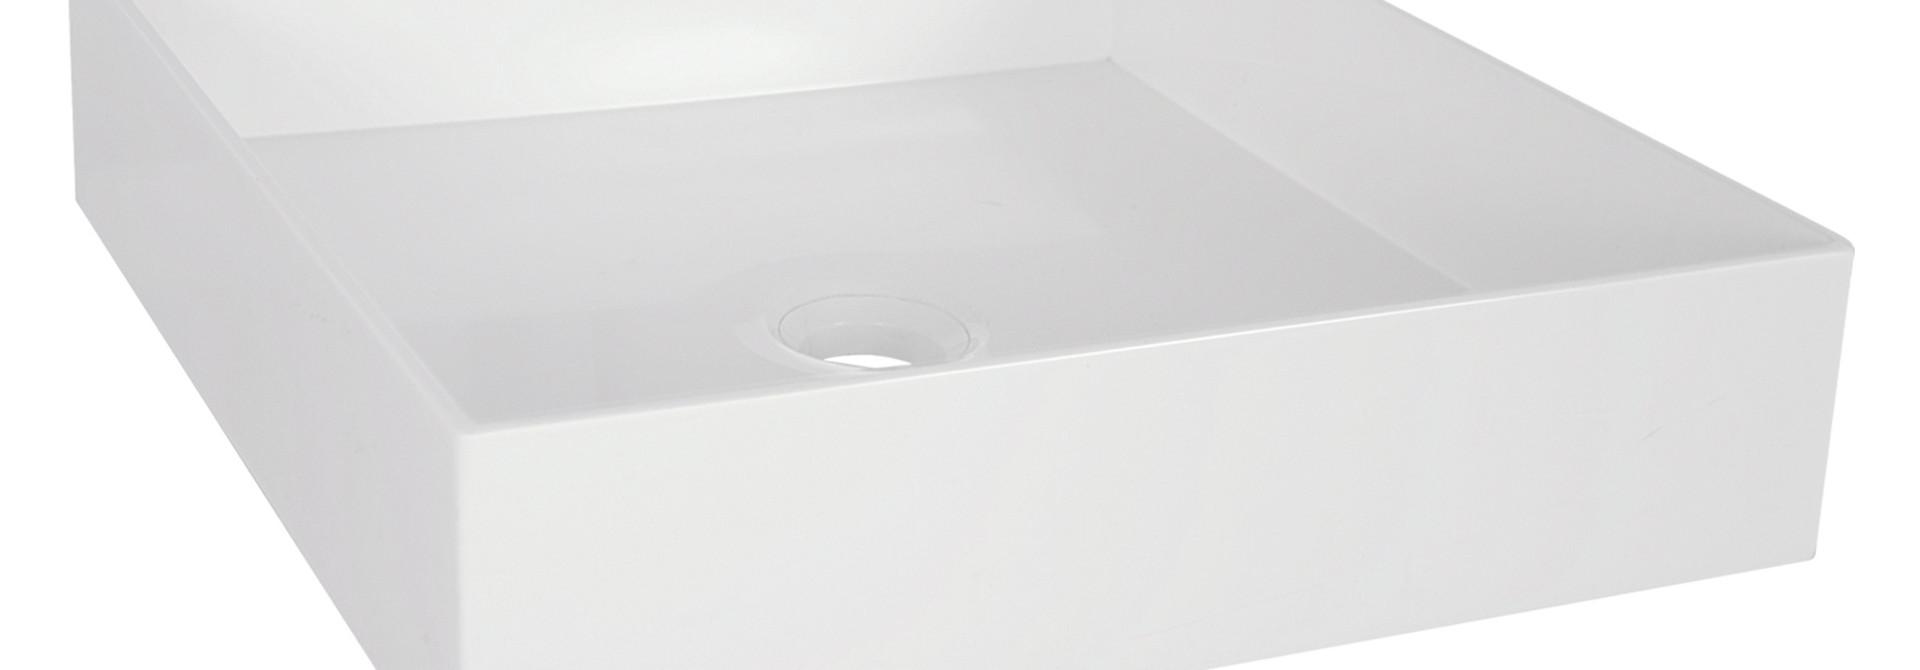 Waskom Polybeton 42x42x10 cm Vierkant